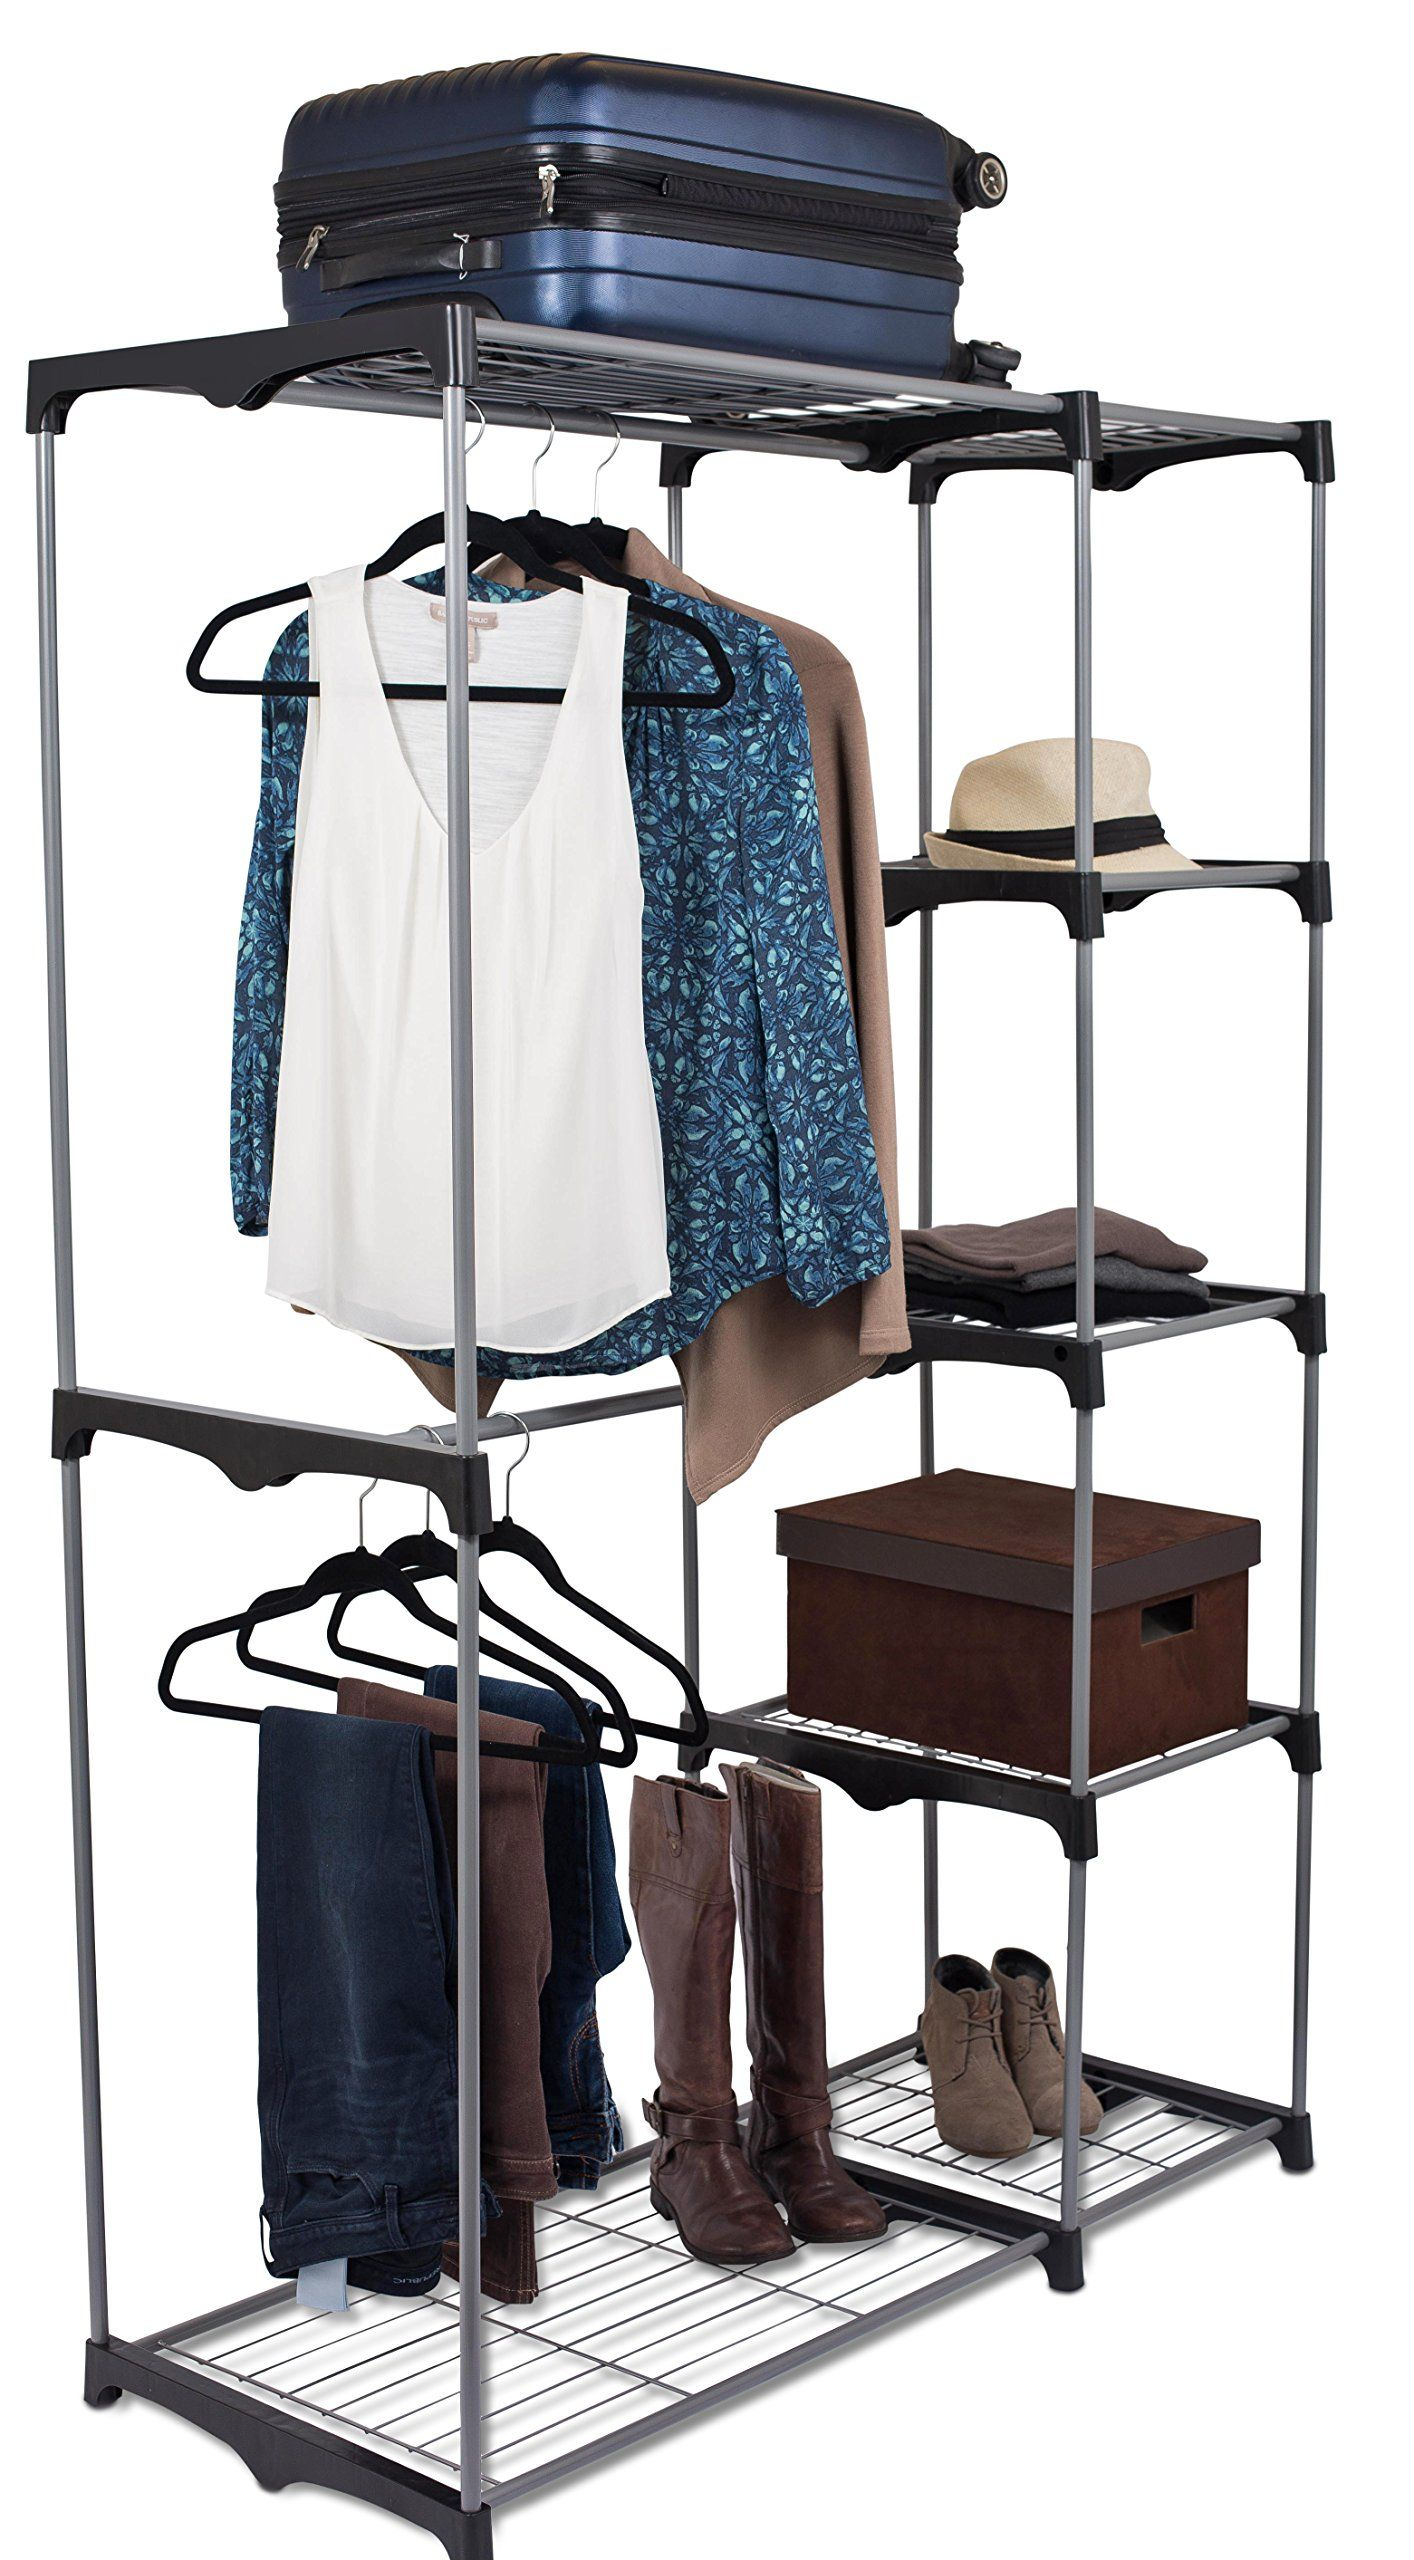 Internets Best Portable Closet Organizer | Double Rod Freestanding Garment  Rack | Multiple Shelving And Shoe